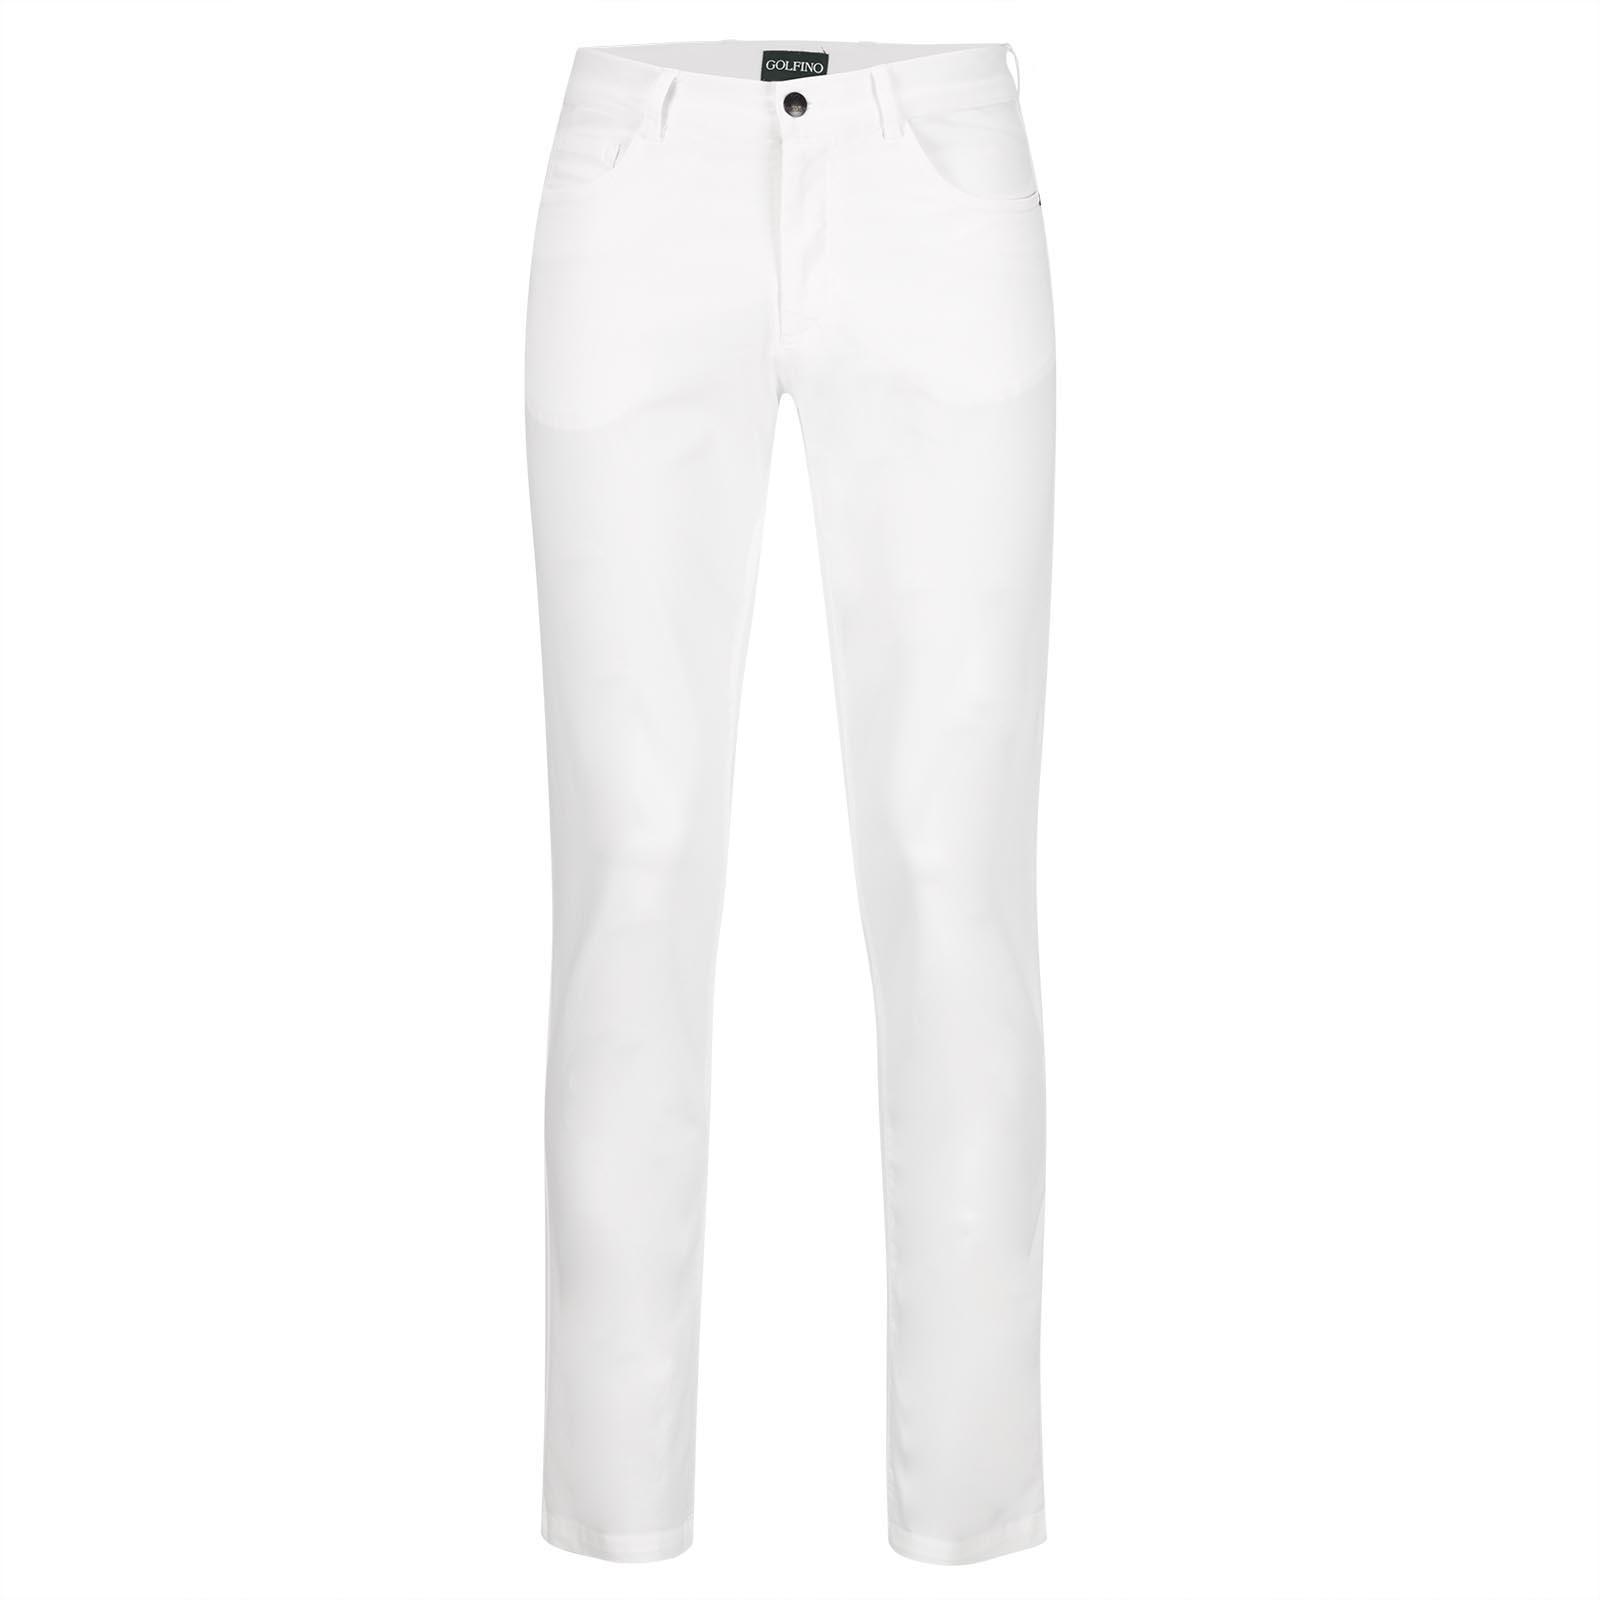 Cotton blend men's golf stretch trousers in modern fit